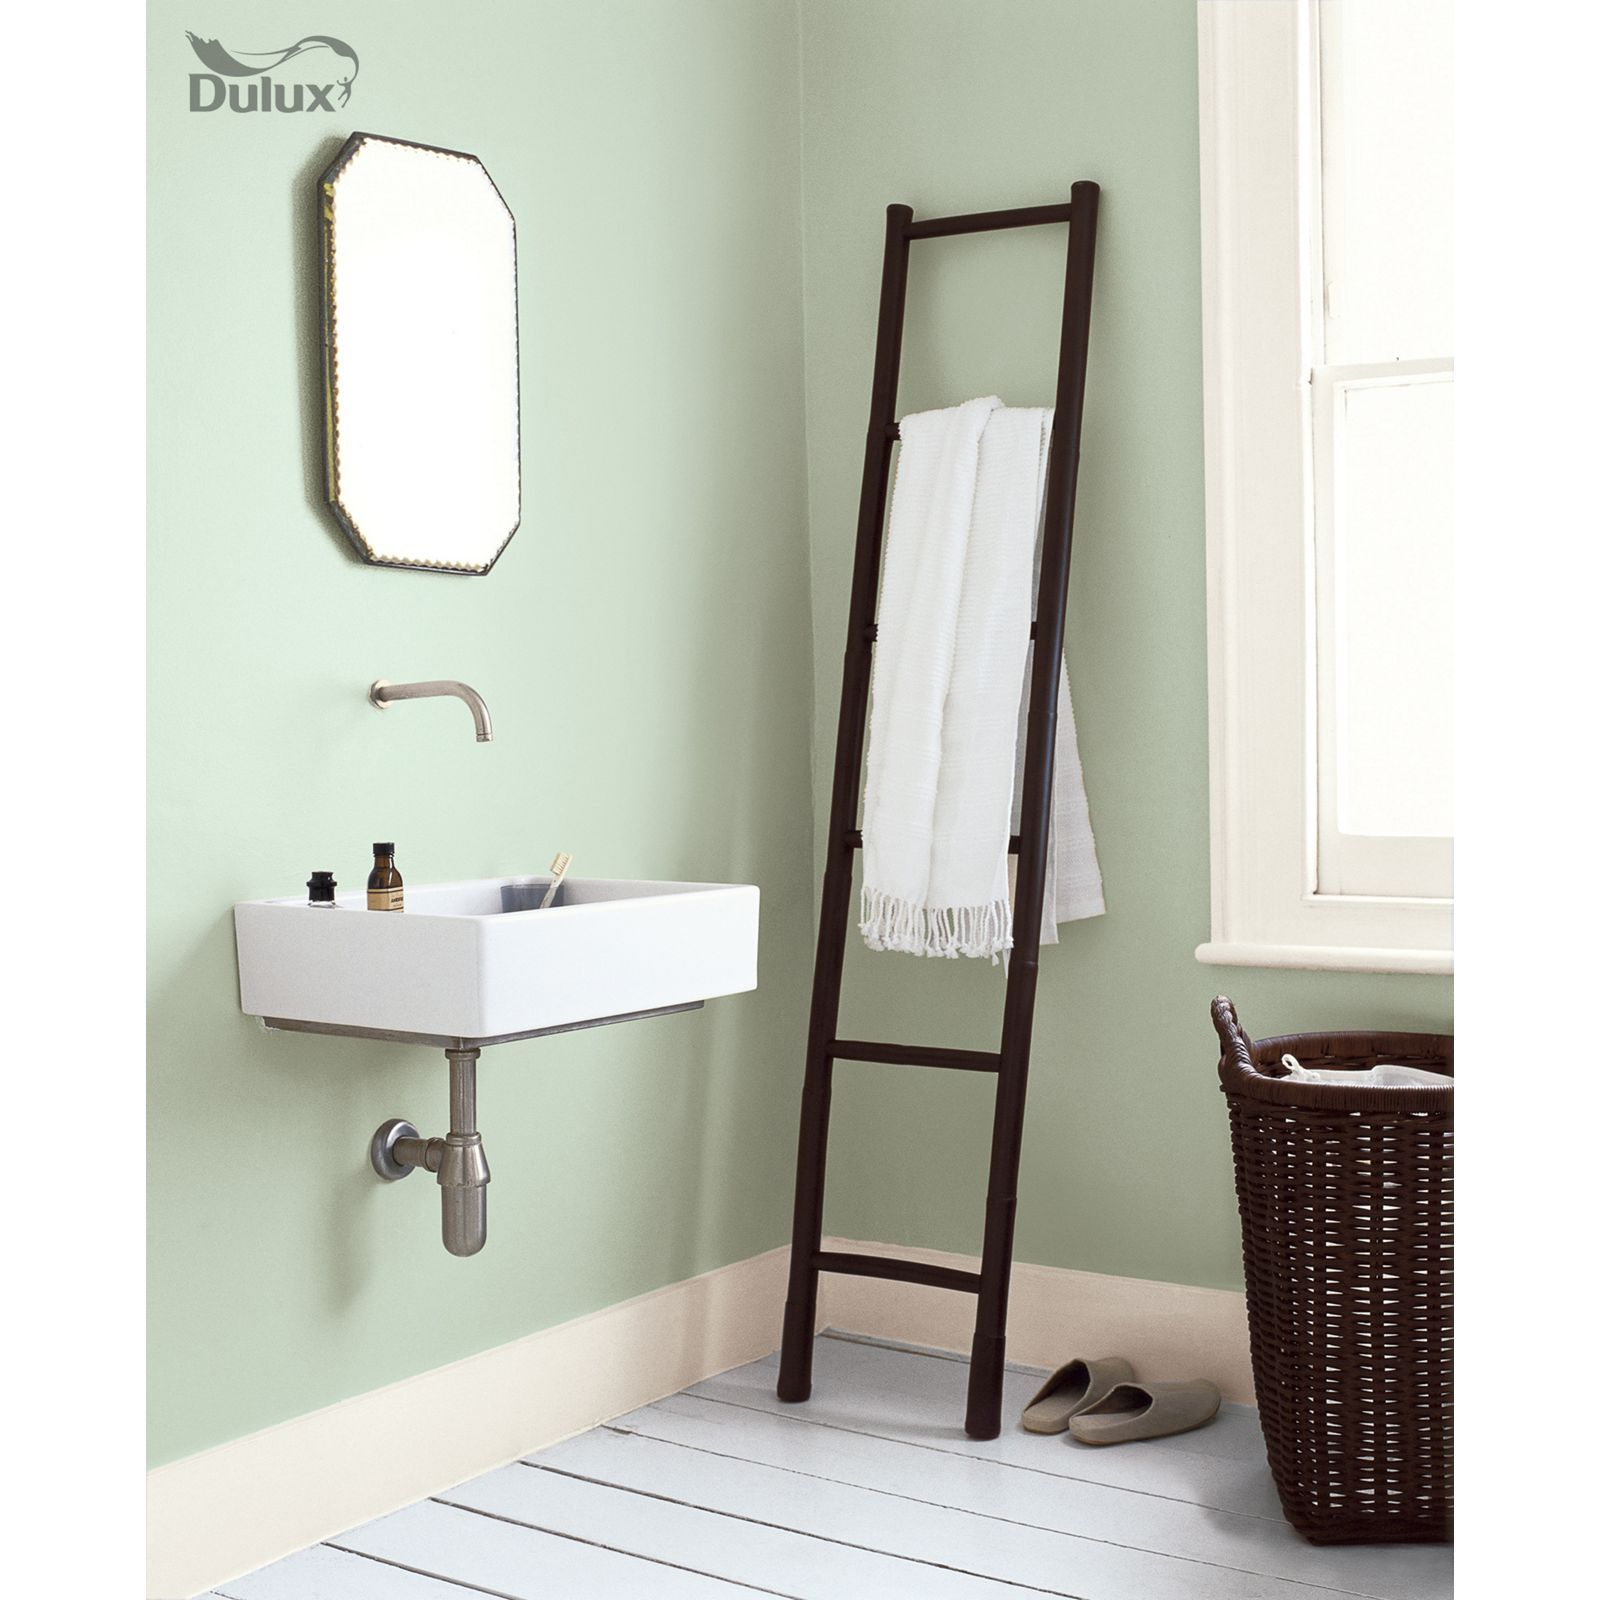 Dulux Easycare Bathroom Willow Tree Soft Sheen Emulsion Paint 2 5l Bathroom Paint Colors Painting Bathroom Dulux